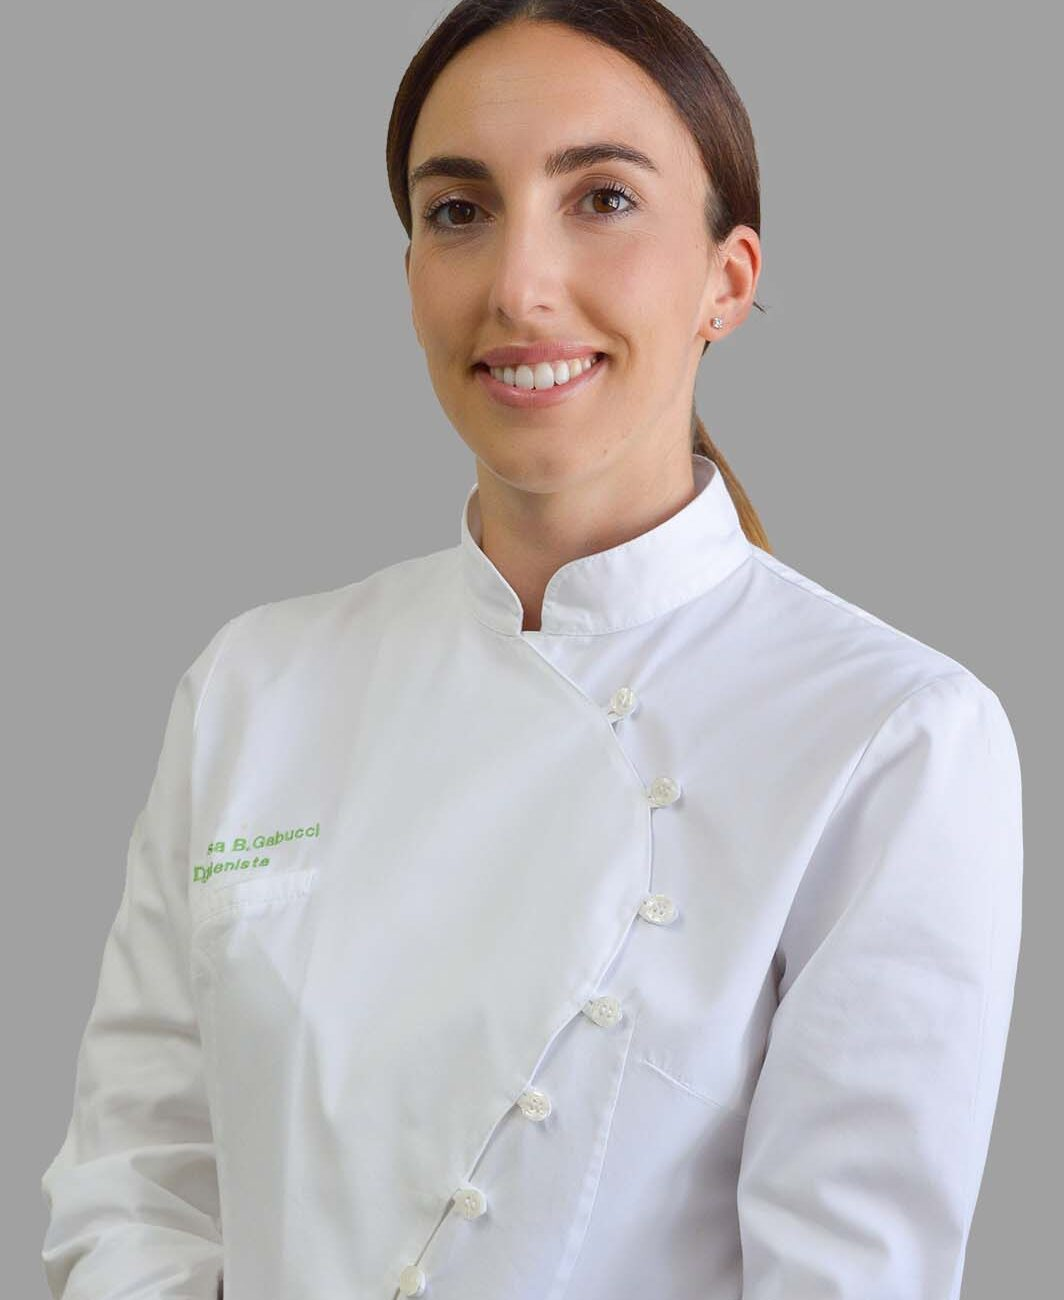 Benedetta Gabucci